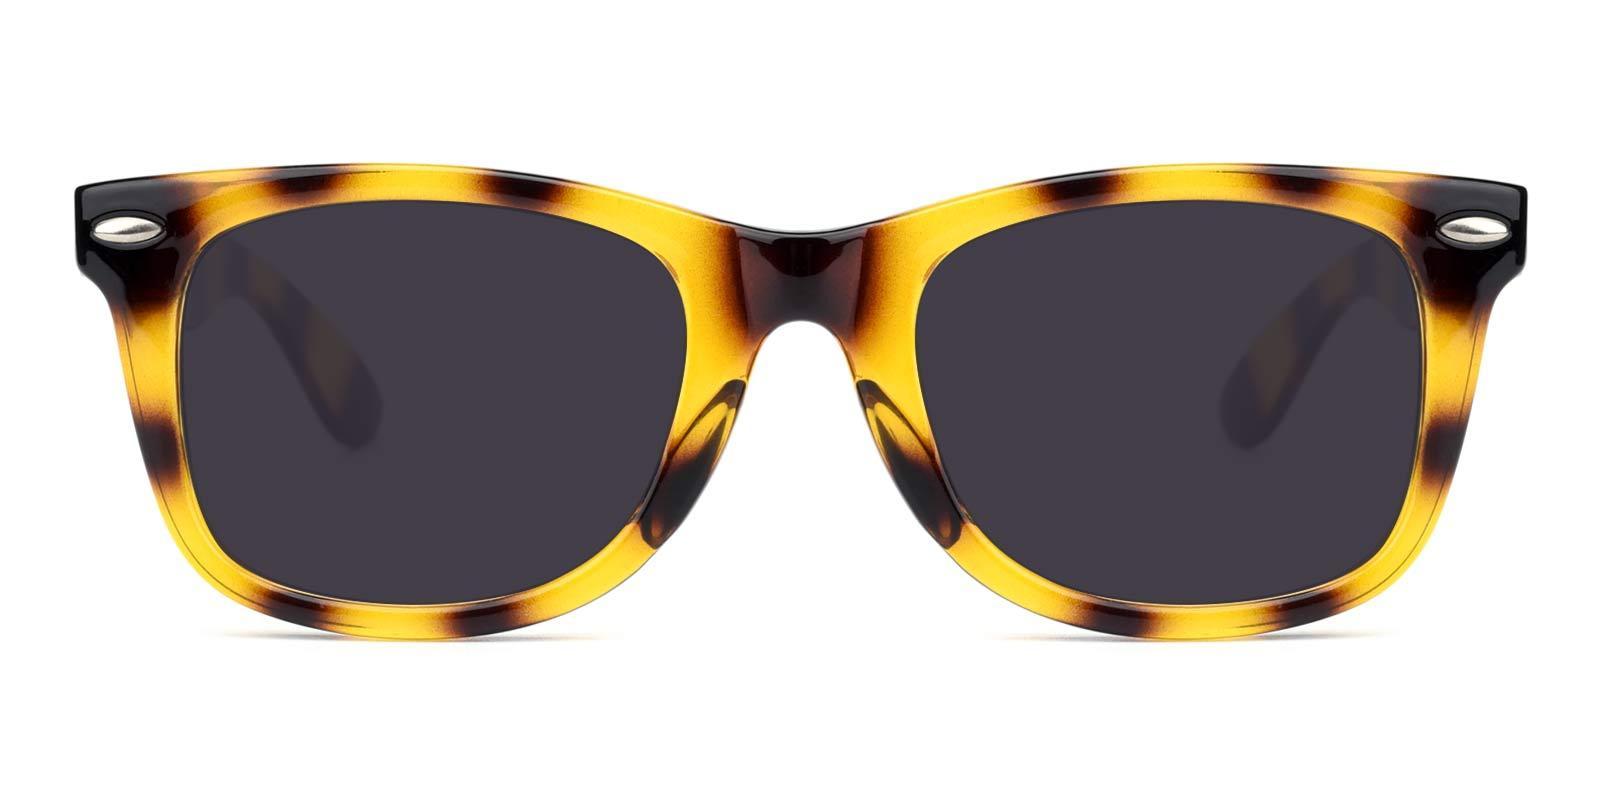 Honeybee-Tortoise-Square-TR-Sunglasses-additional2